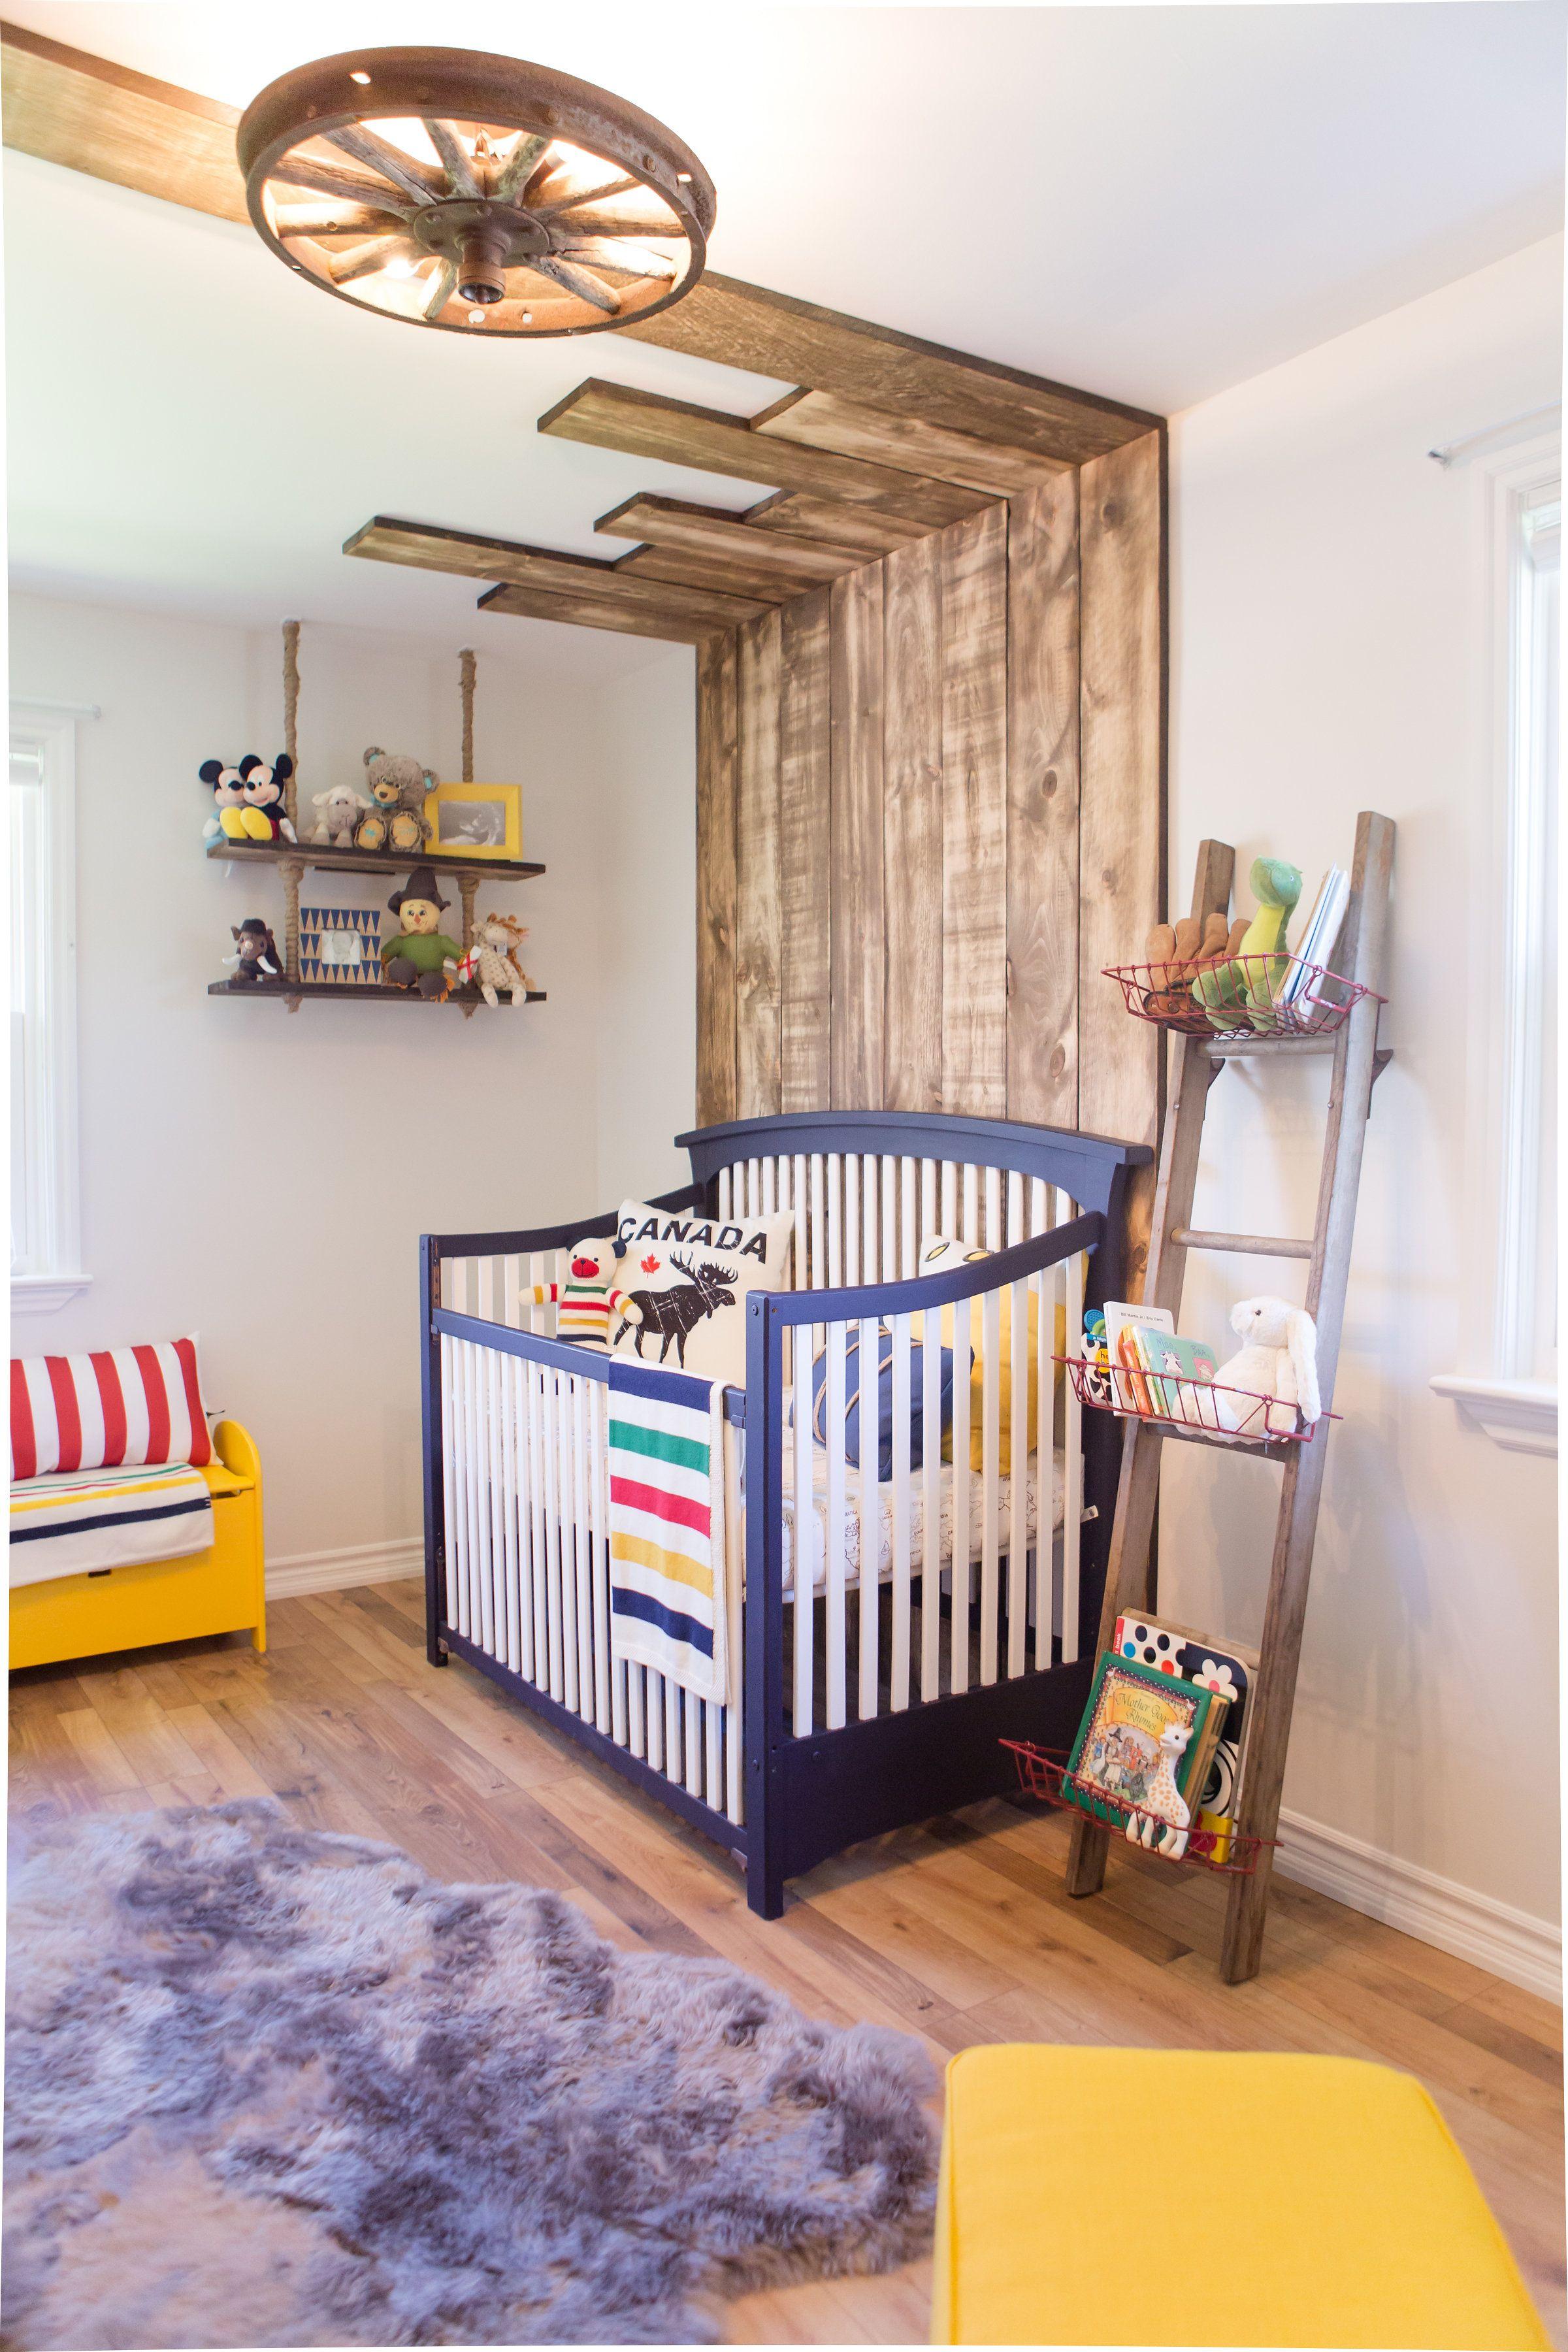 Hbc nursery project nursery nursery accent wall